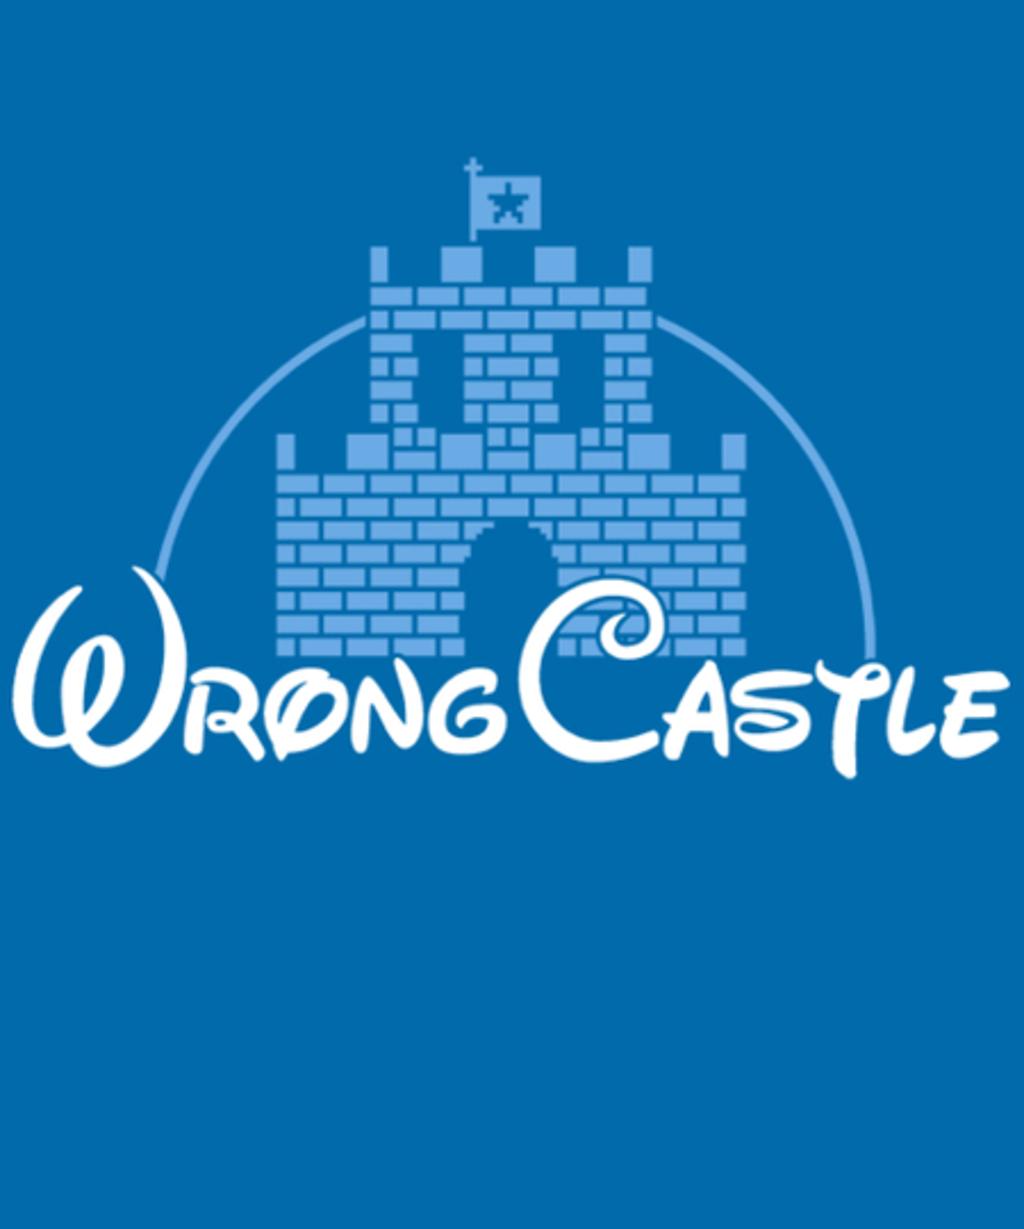 Qwertee: Wrong Castle